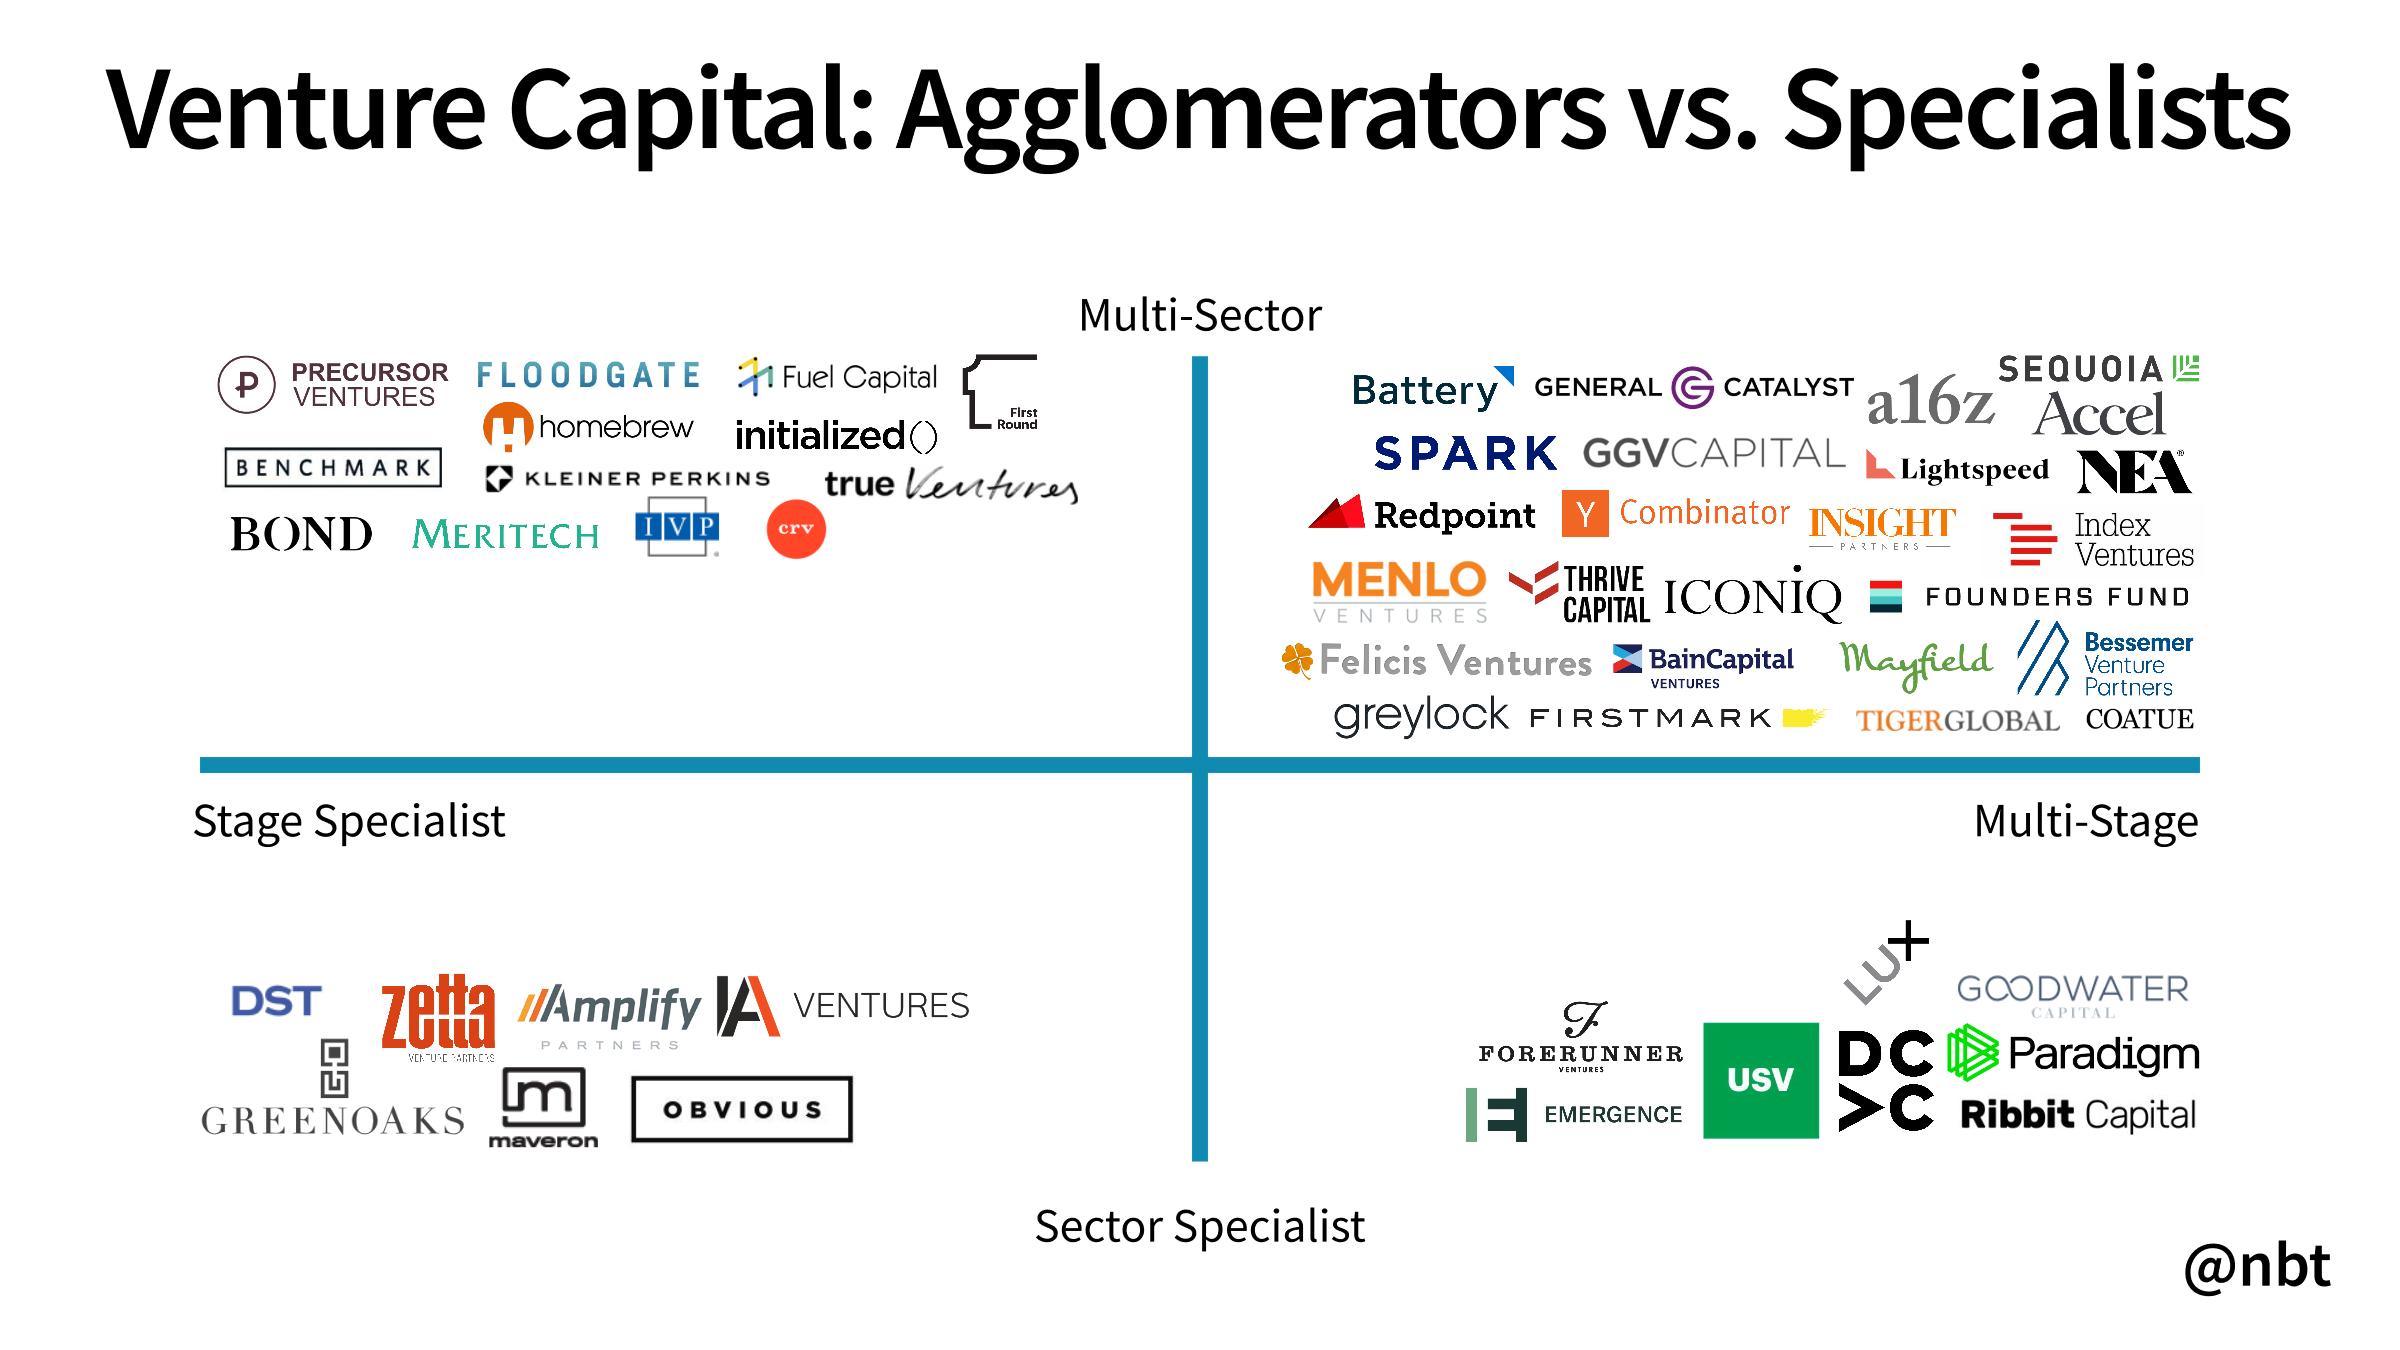 Agglomerators Vs Specialists